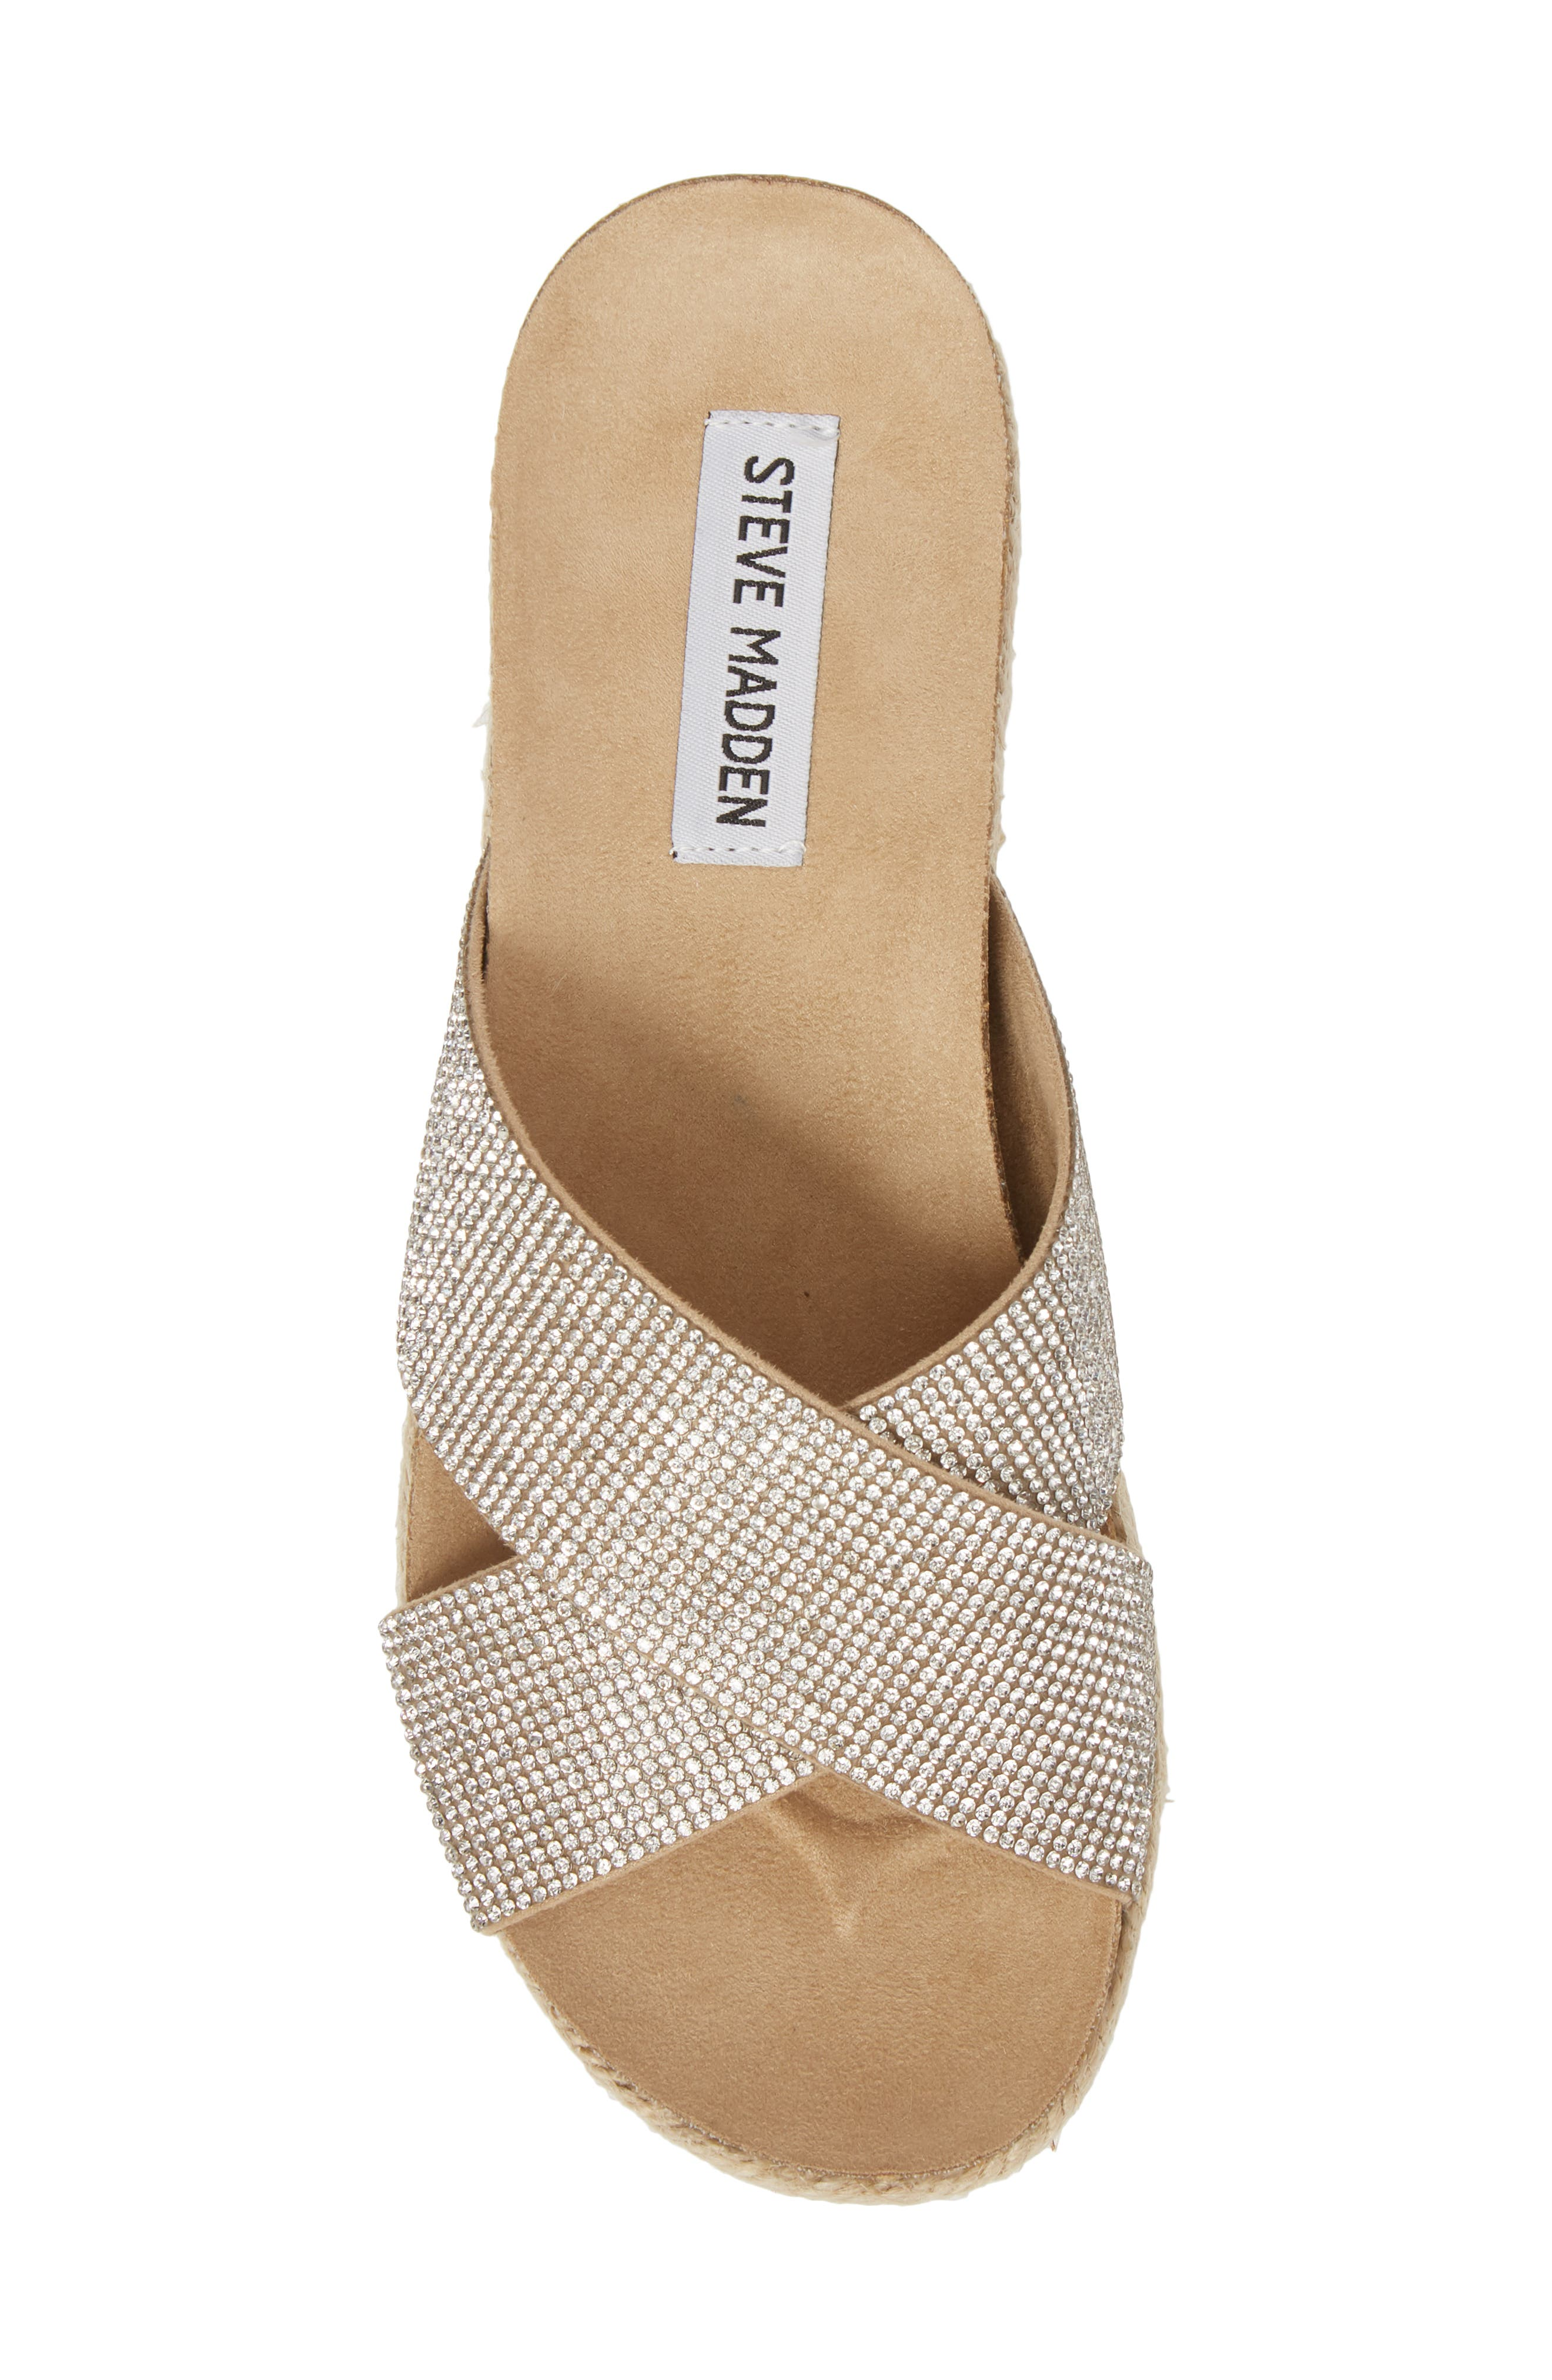 Arran-R Platform Espadrille Sandal,                             Alternate thumbnail 5, color,                             Silver